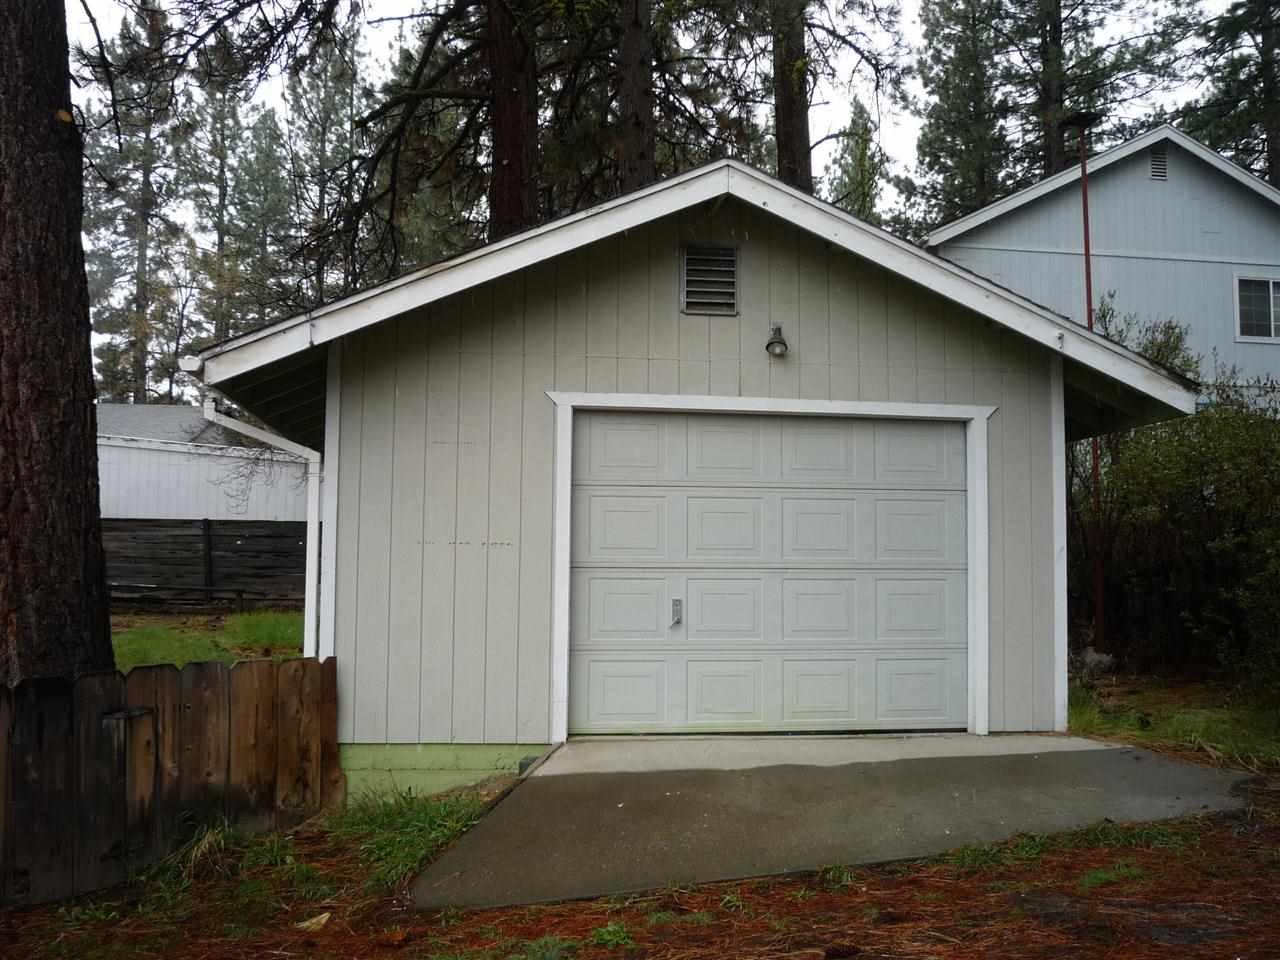 Additional photo for property listing at 660 Pacific Street 660 Pacific Street Portola, California 96122 Estados Unidos